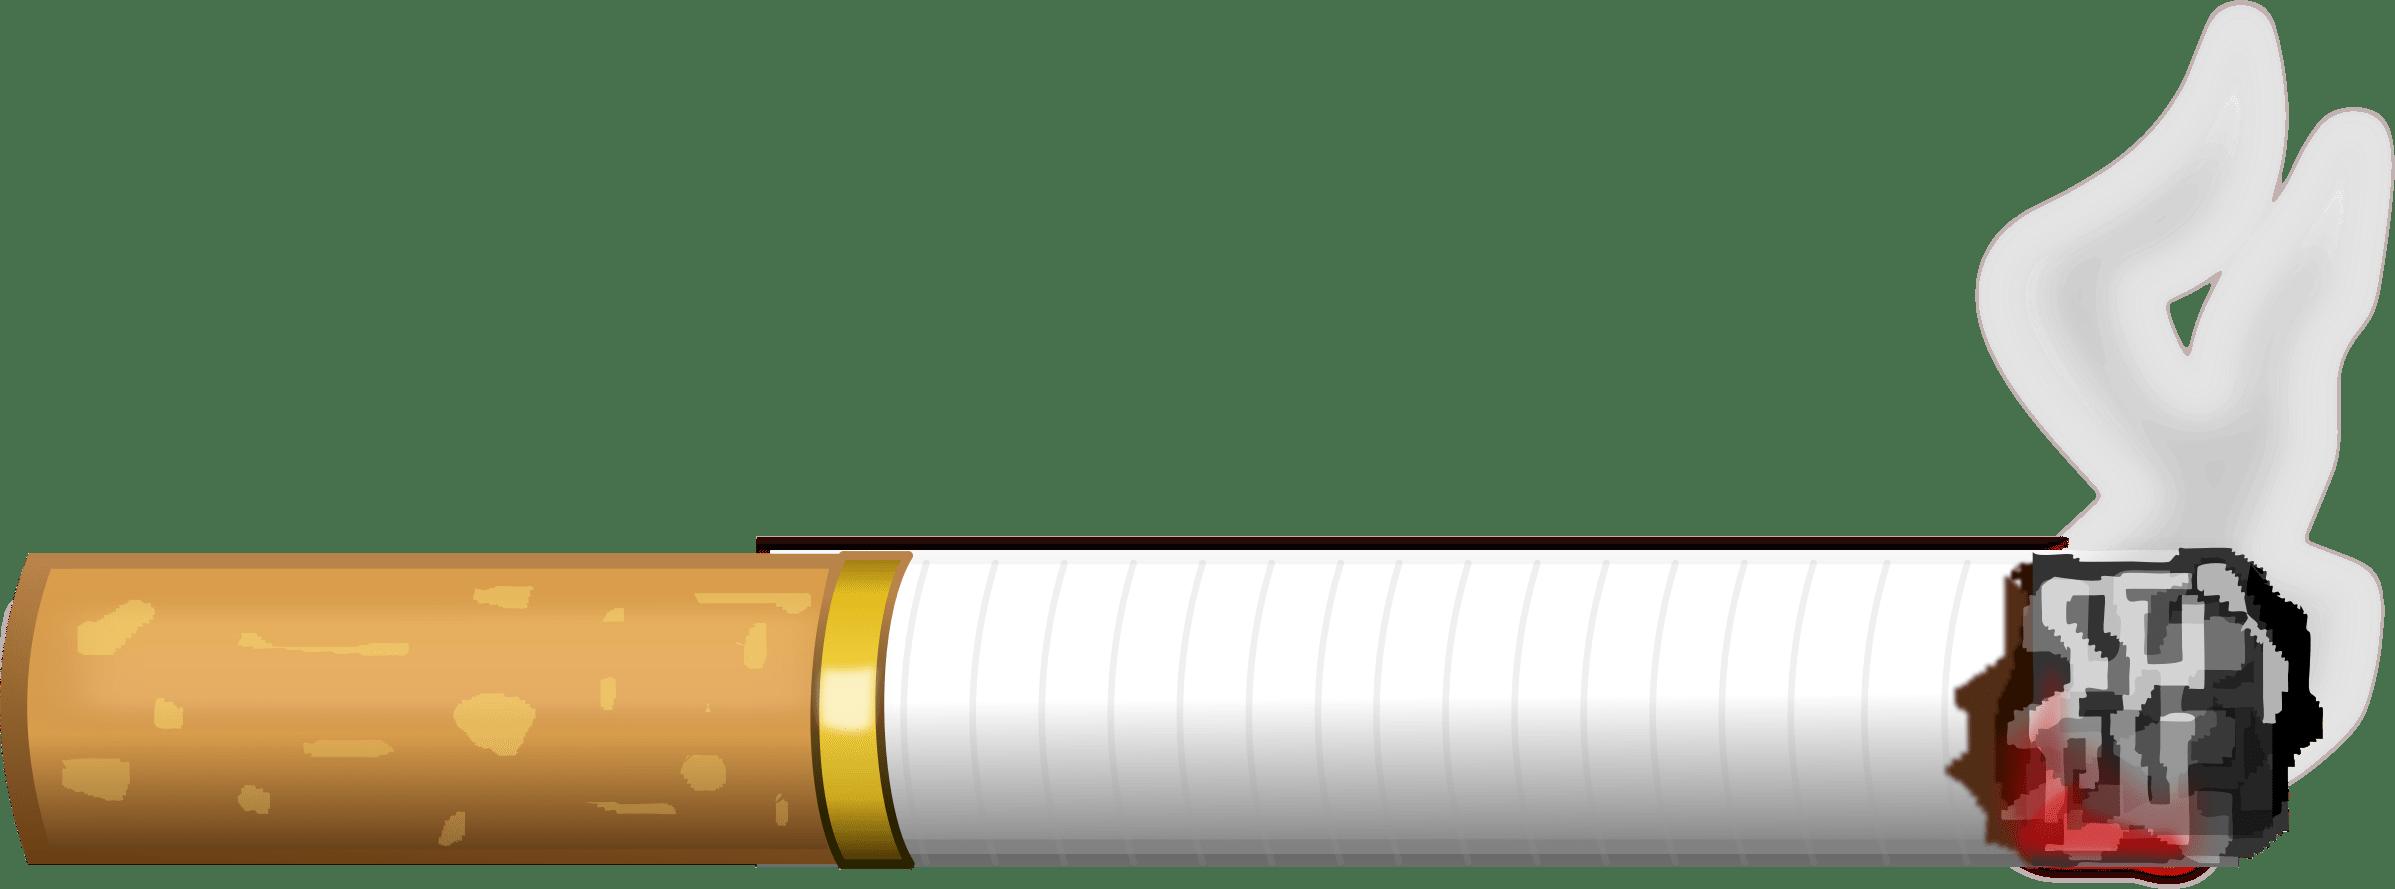 clip freeuse stock Smoking no tobacco free. Cigarette clipart tabacco.